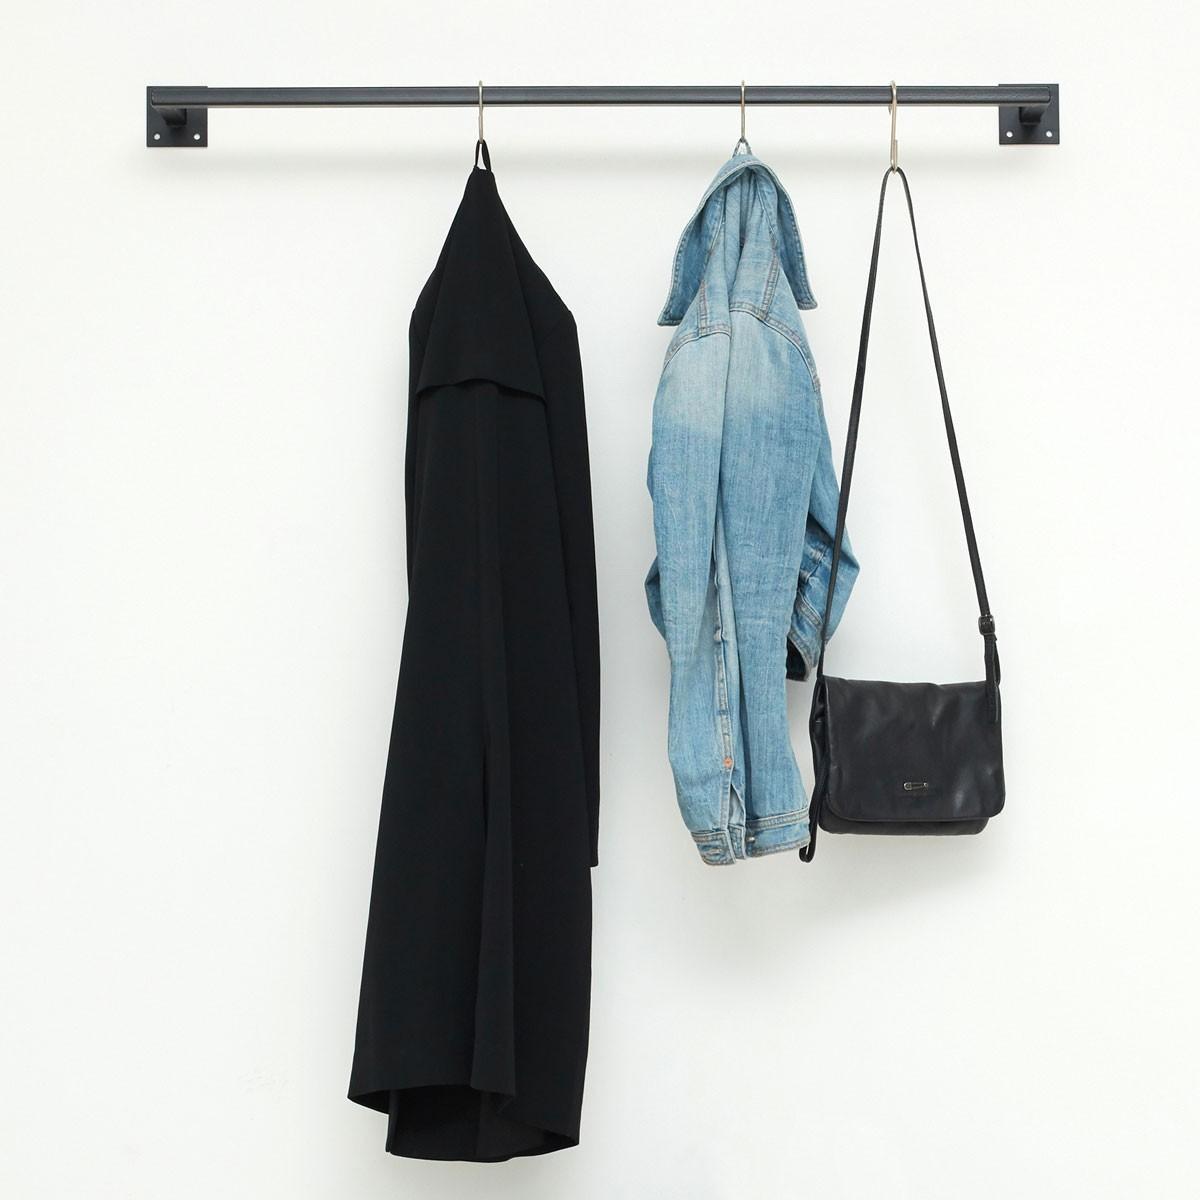 Garderobe Industrial Style